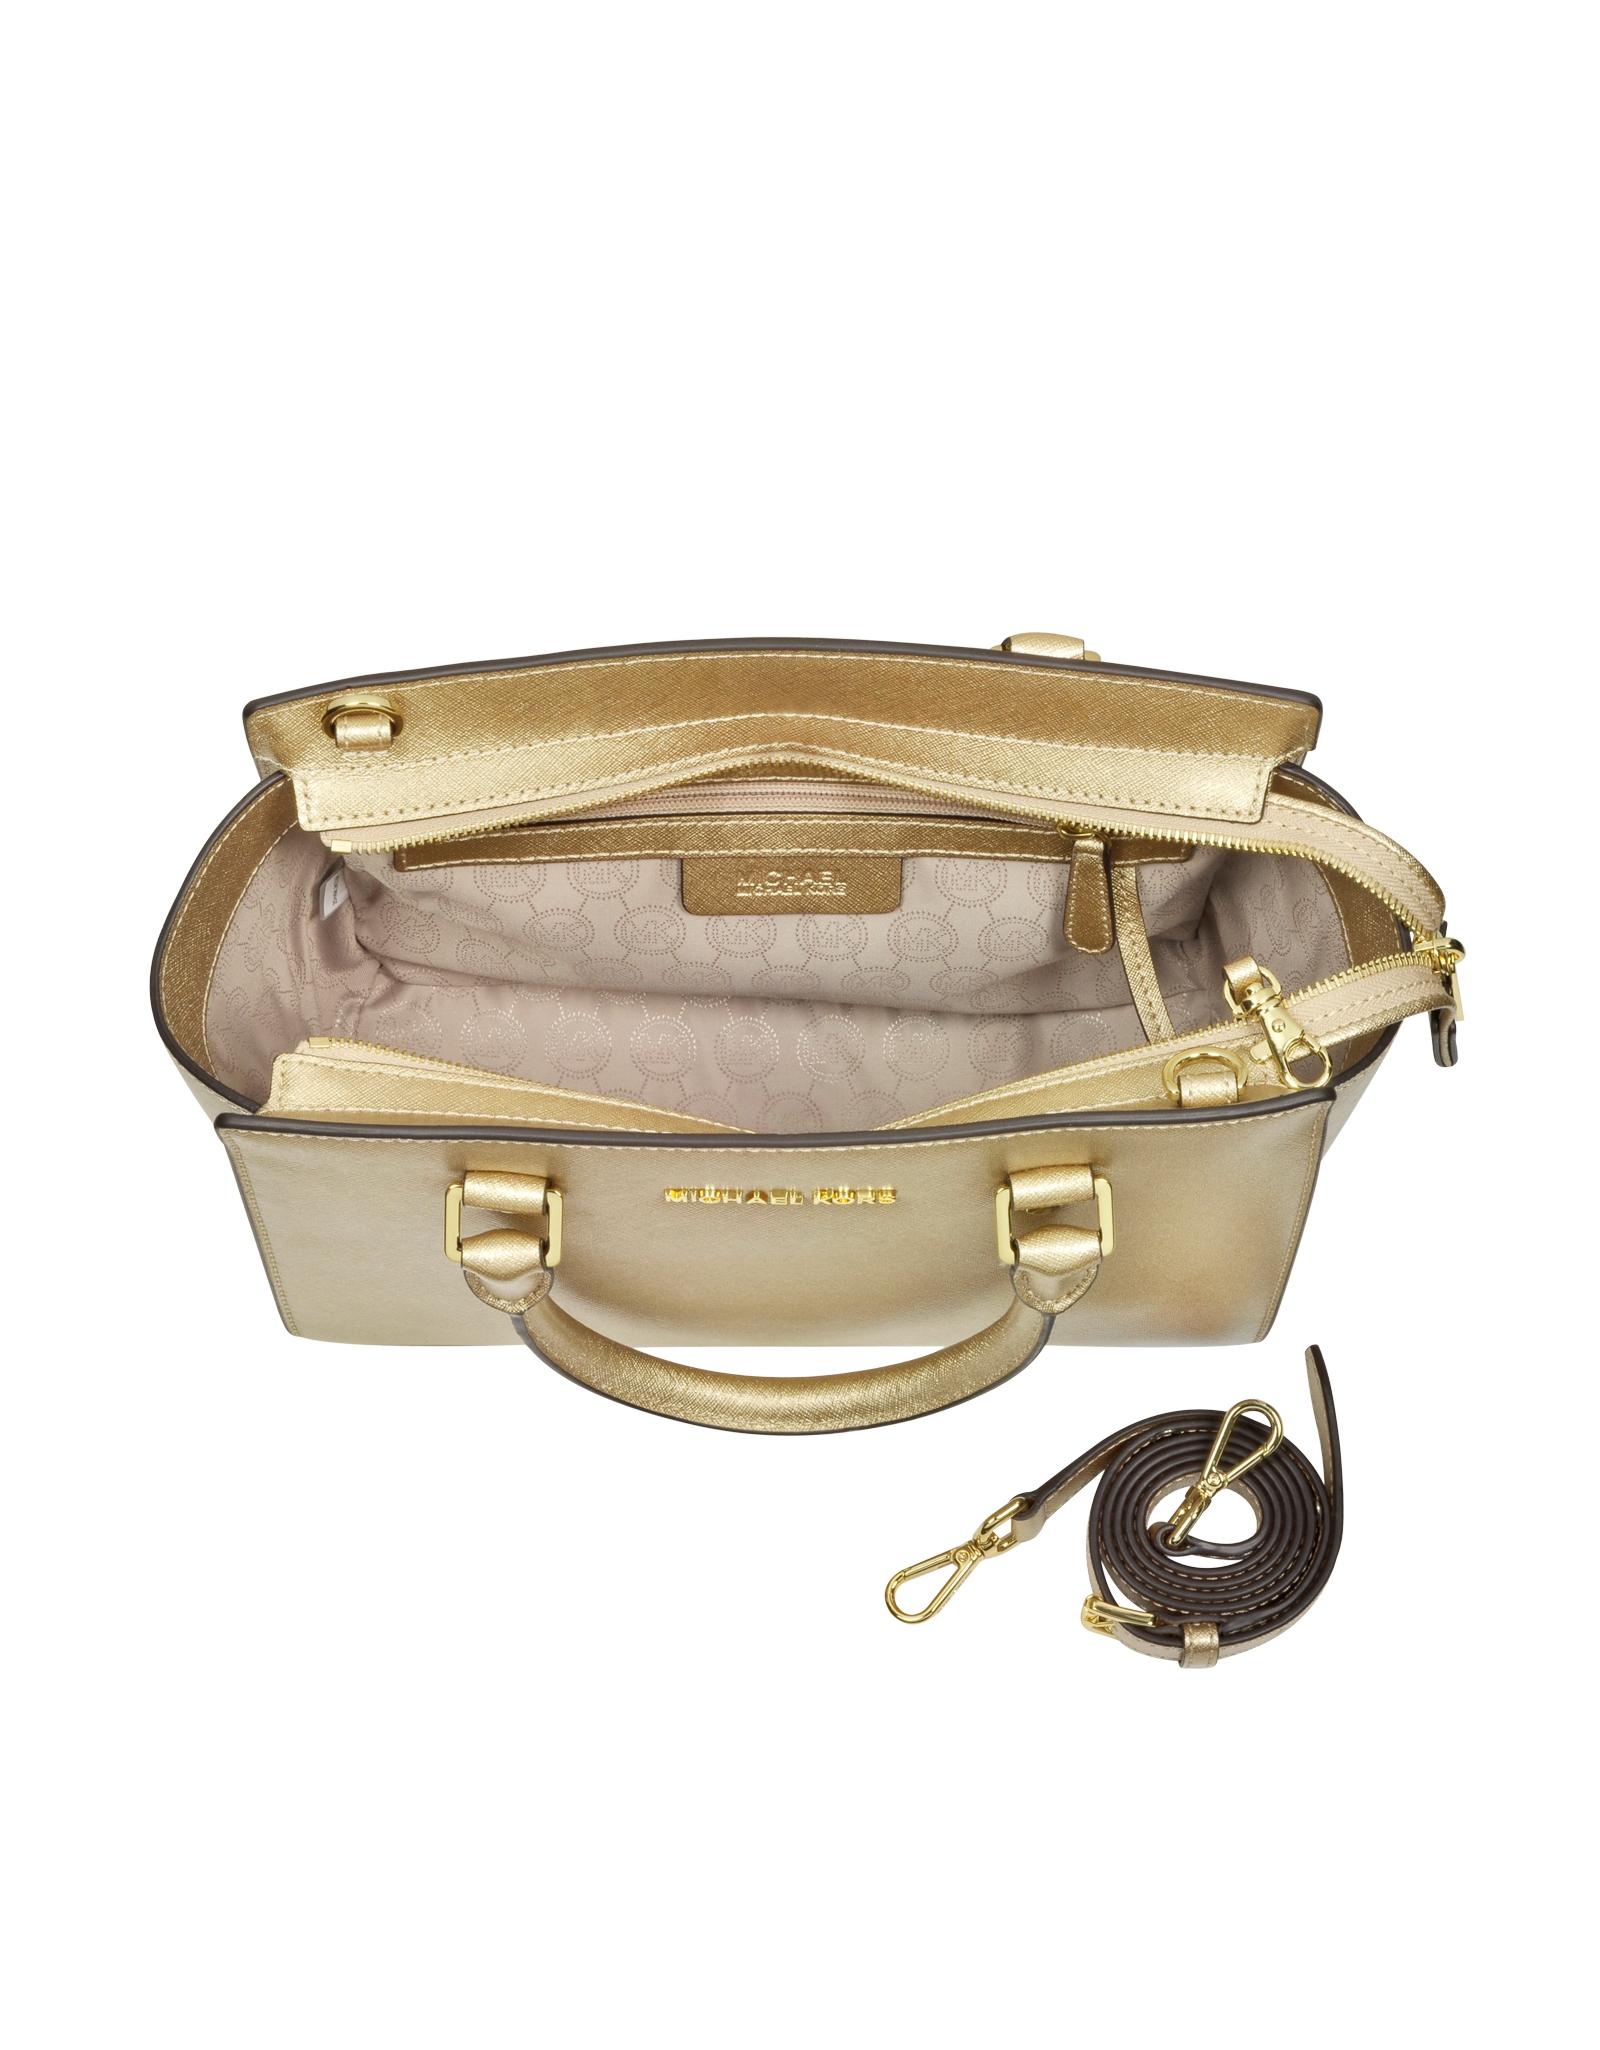 Lyst - Michael Kors Selma Saffiano Leather Medium Satchel Bag in ... 3e495abe9e4cd